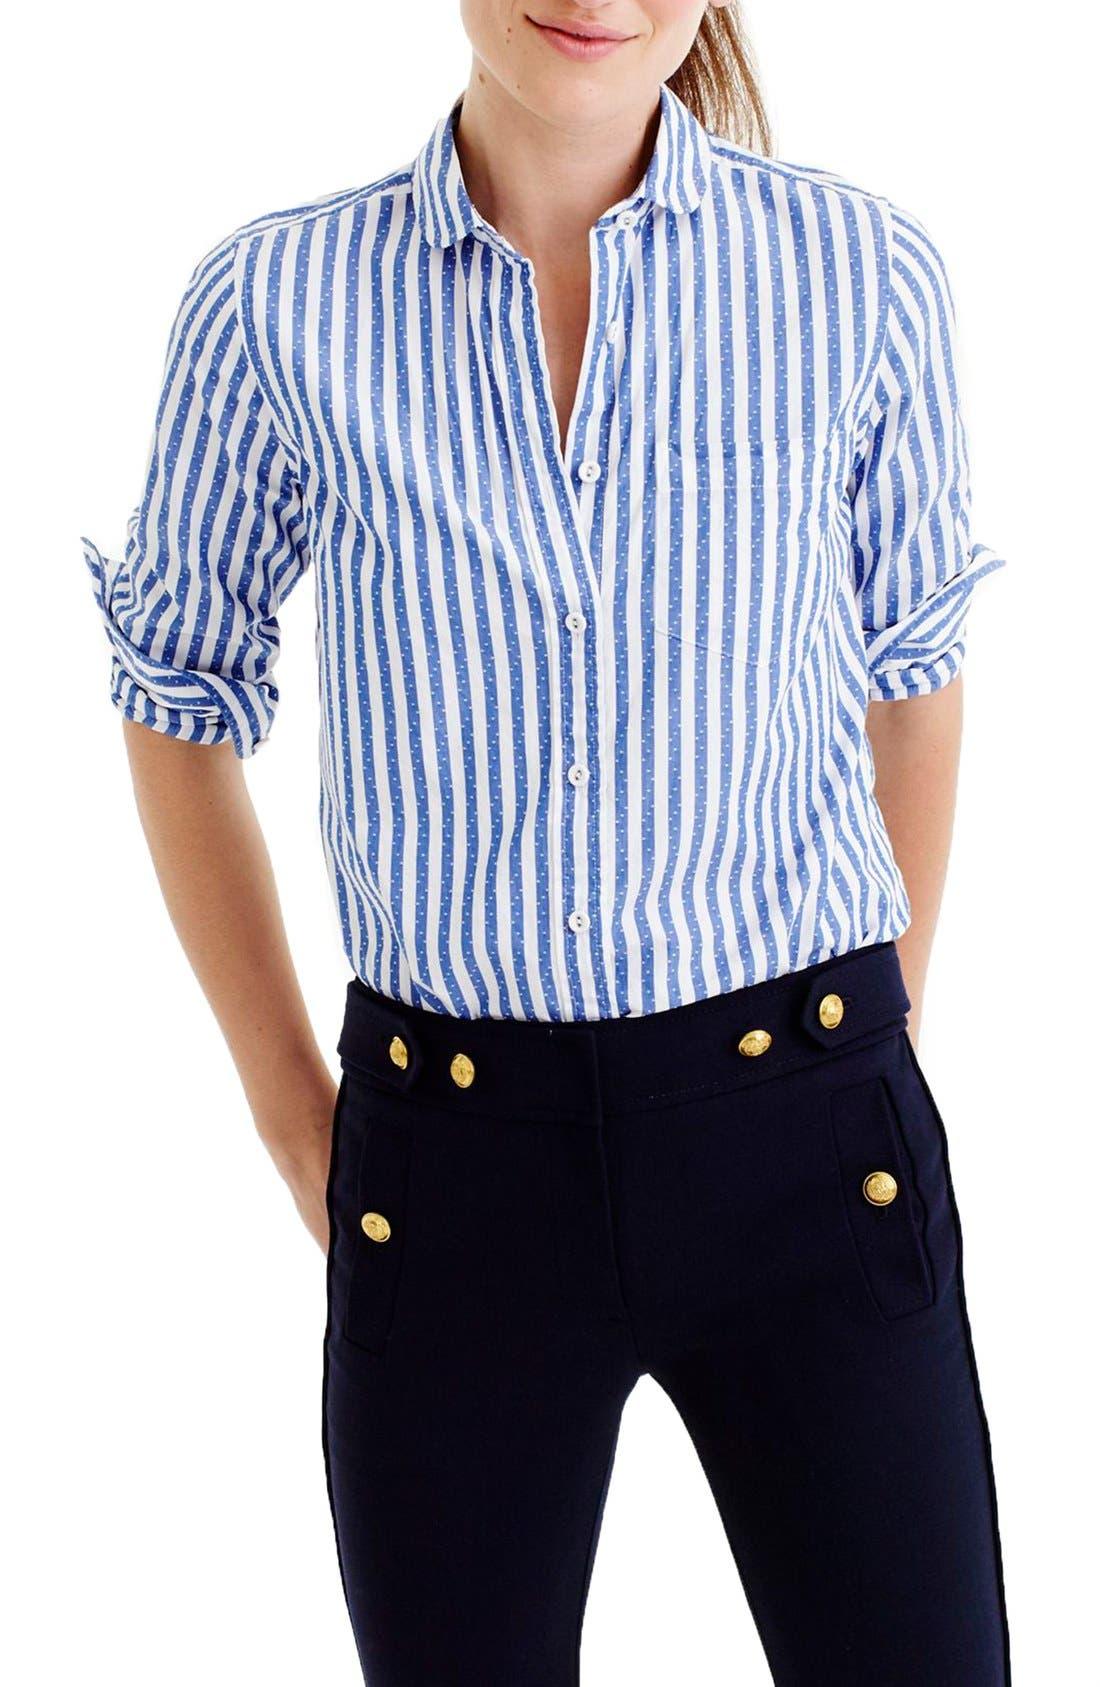 Alternate Image 1 Selected - J.Crew Club Collar Jacquard Stripe Boy Shirt (Regular & Petite)